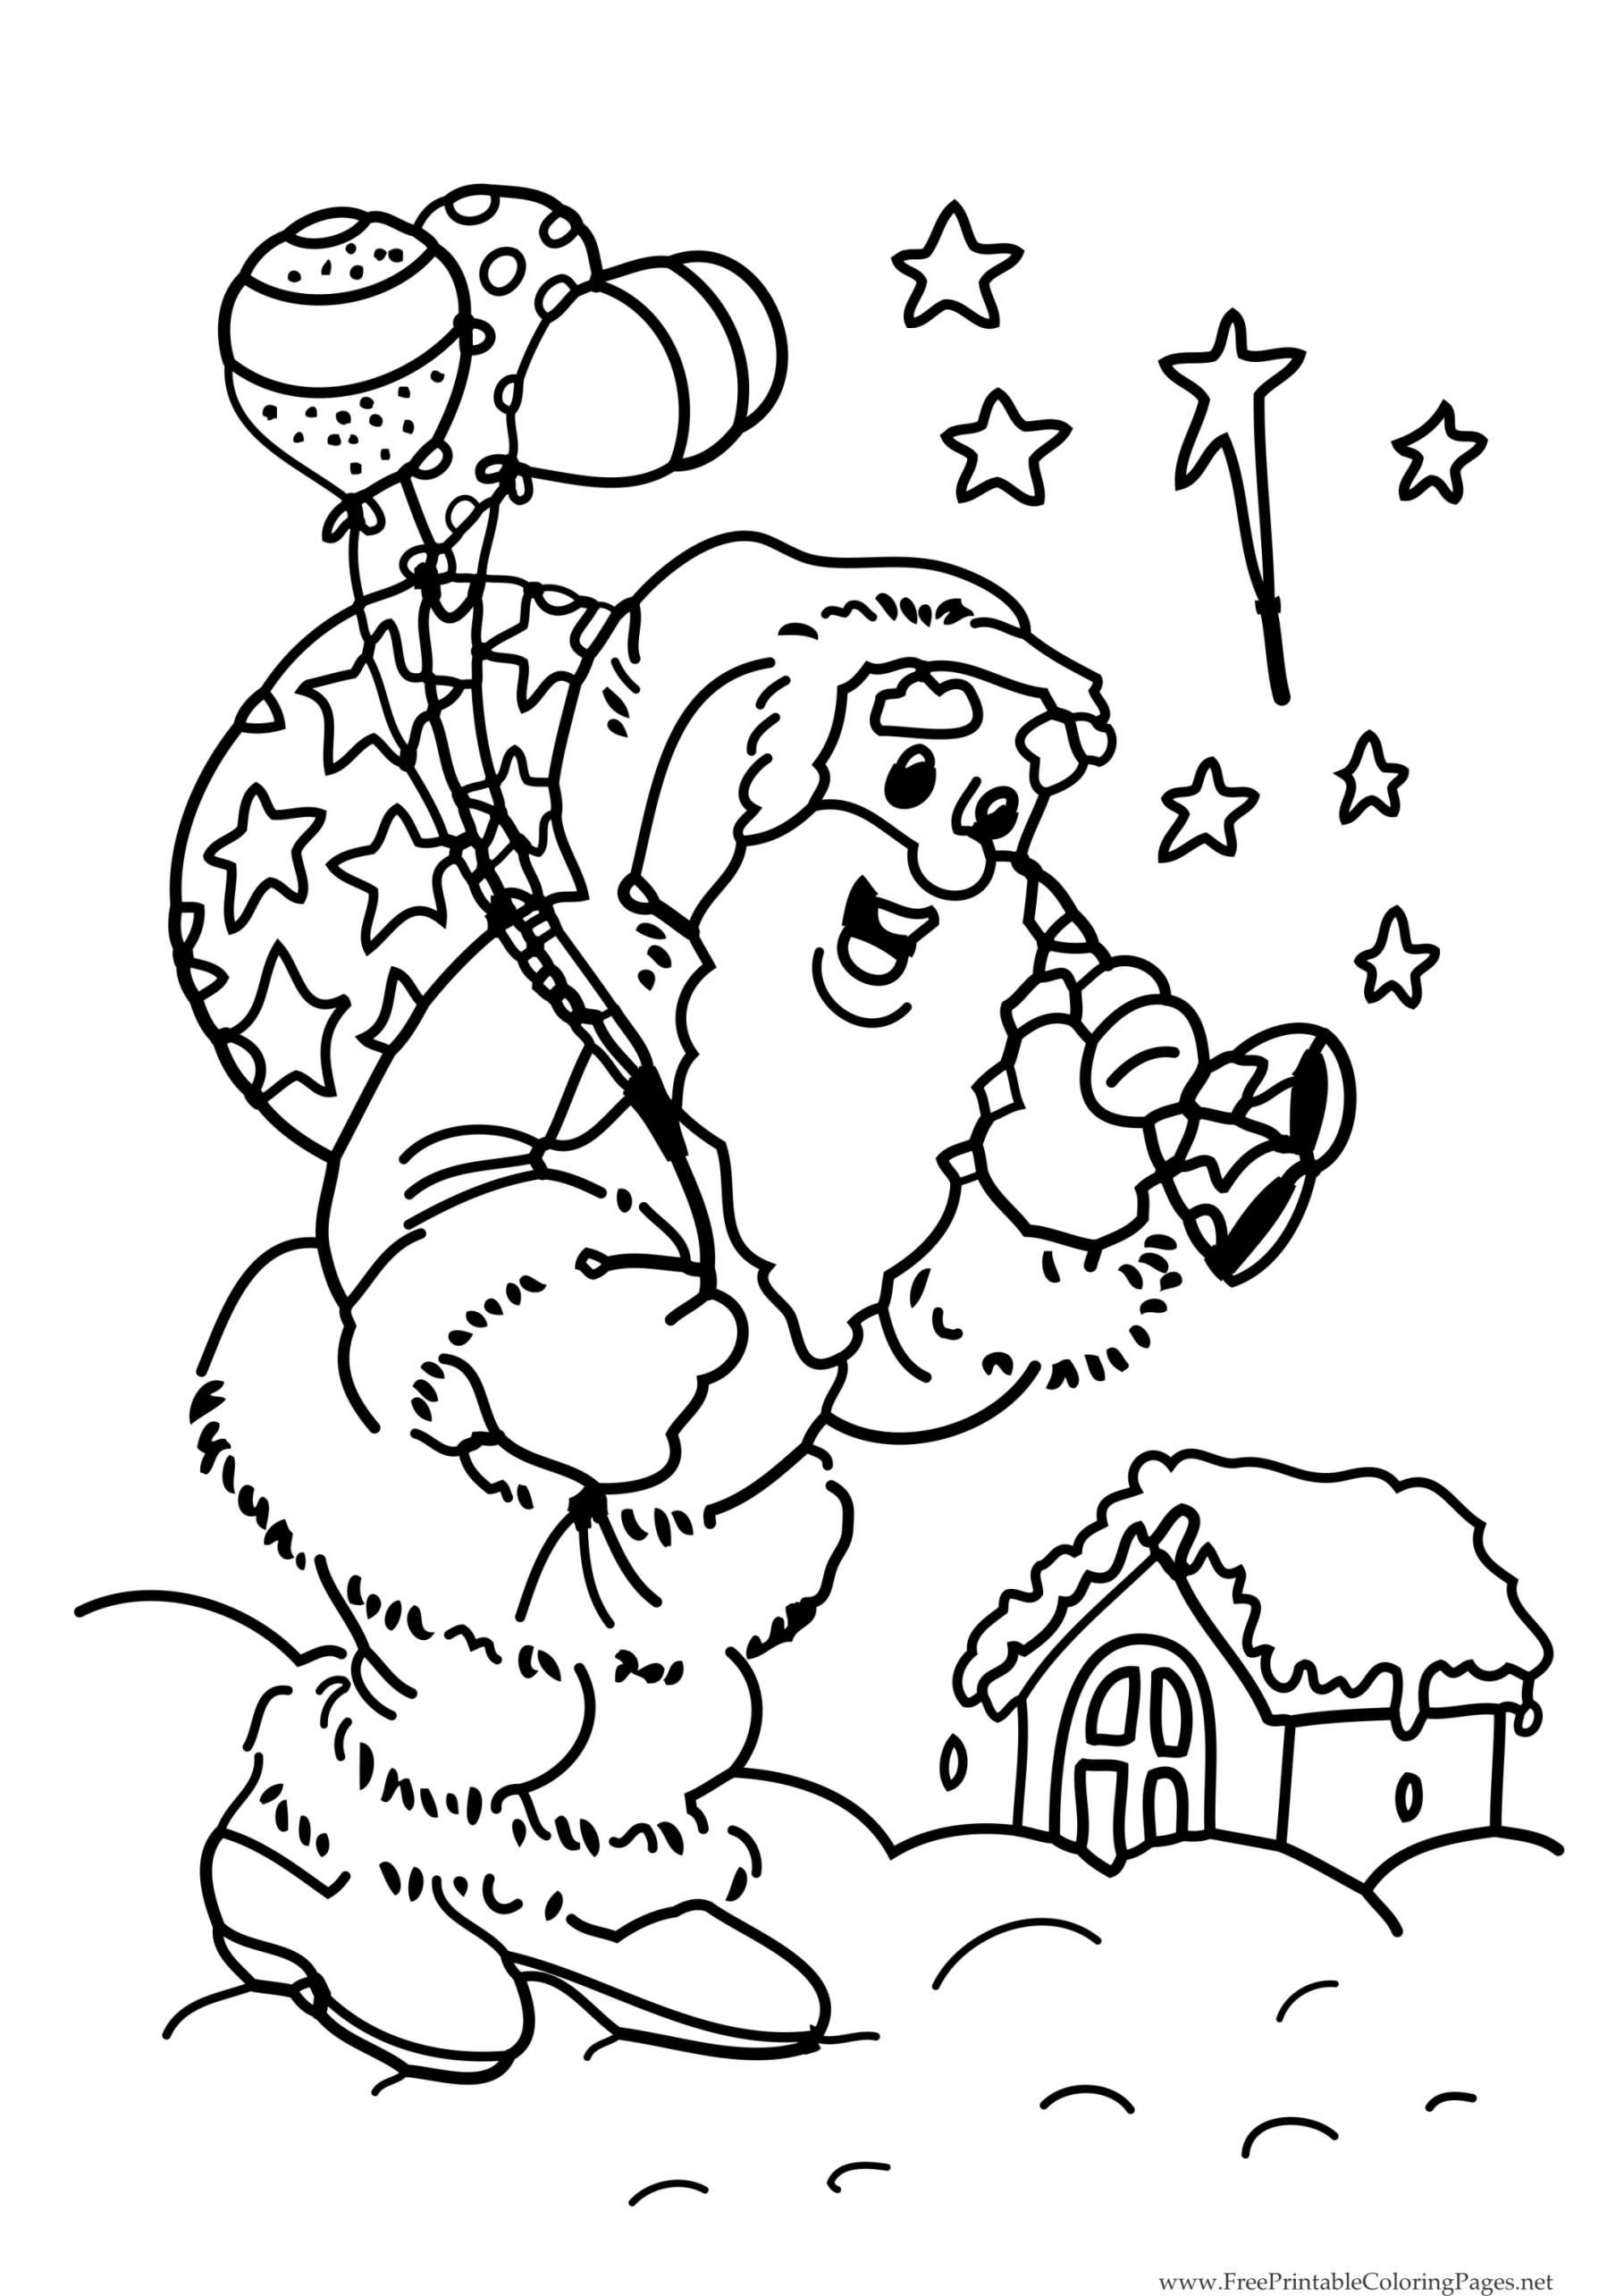 Santa Claus For Kids